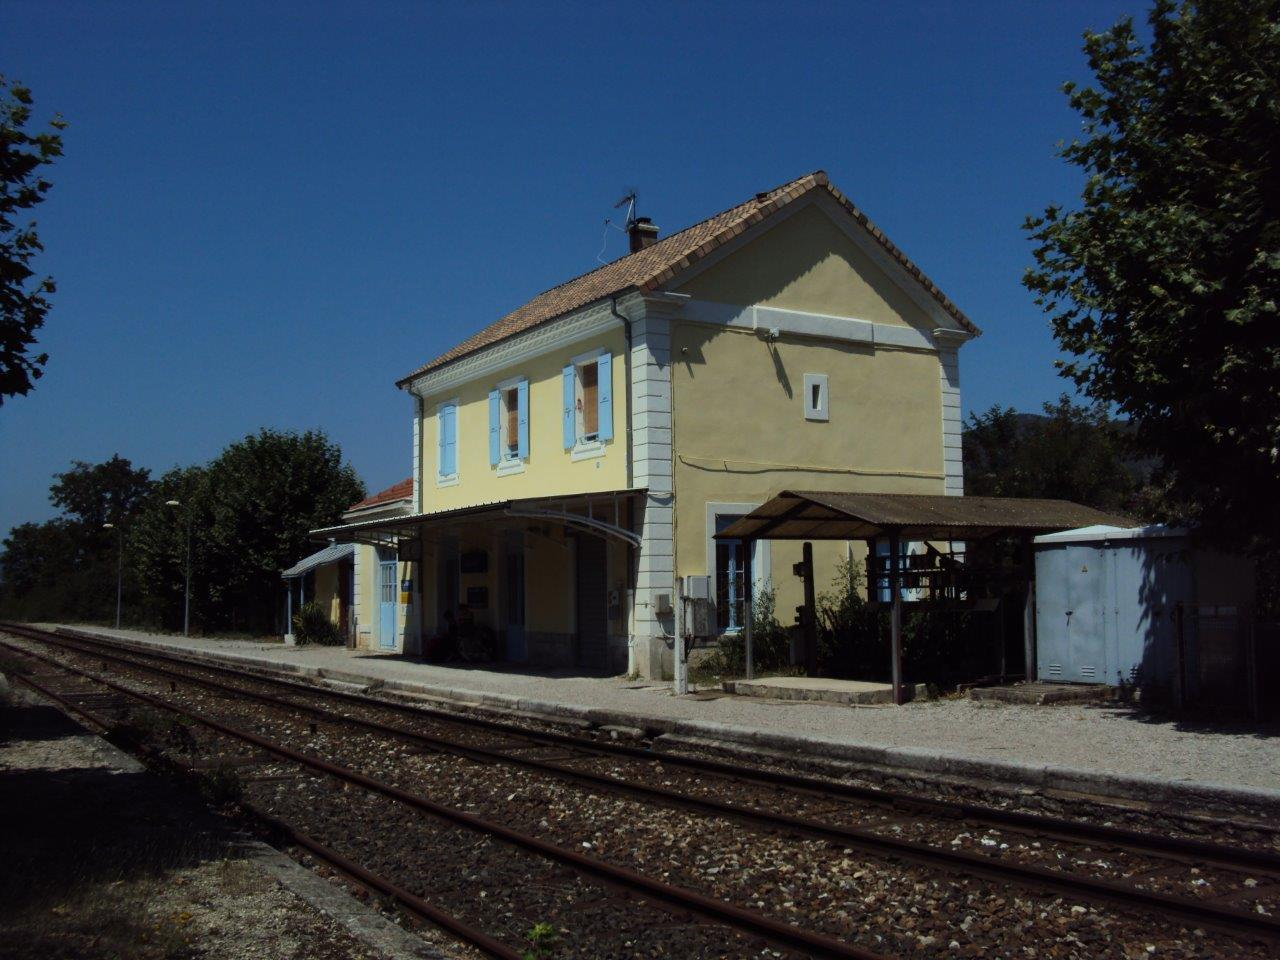 gare-de-saillans-train-station